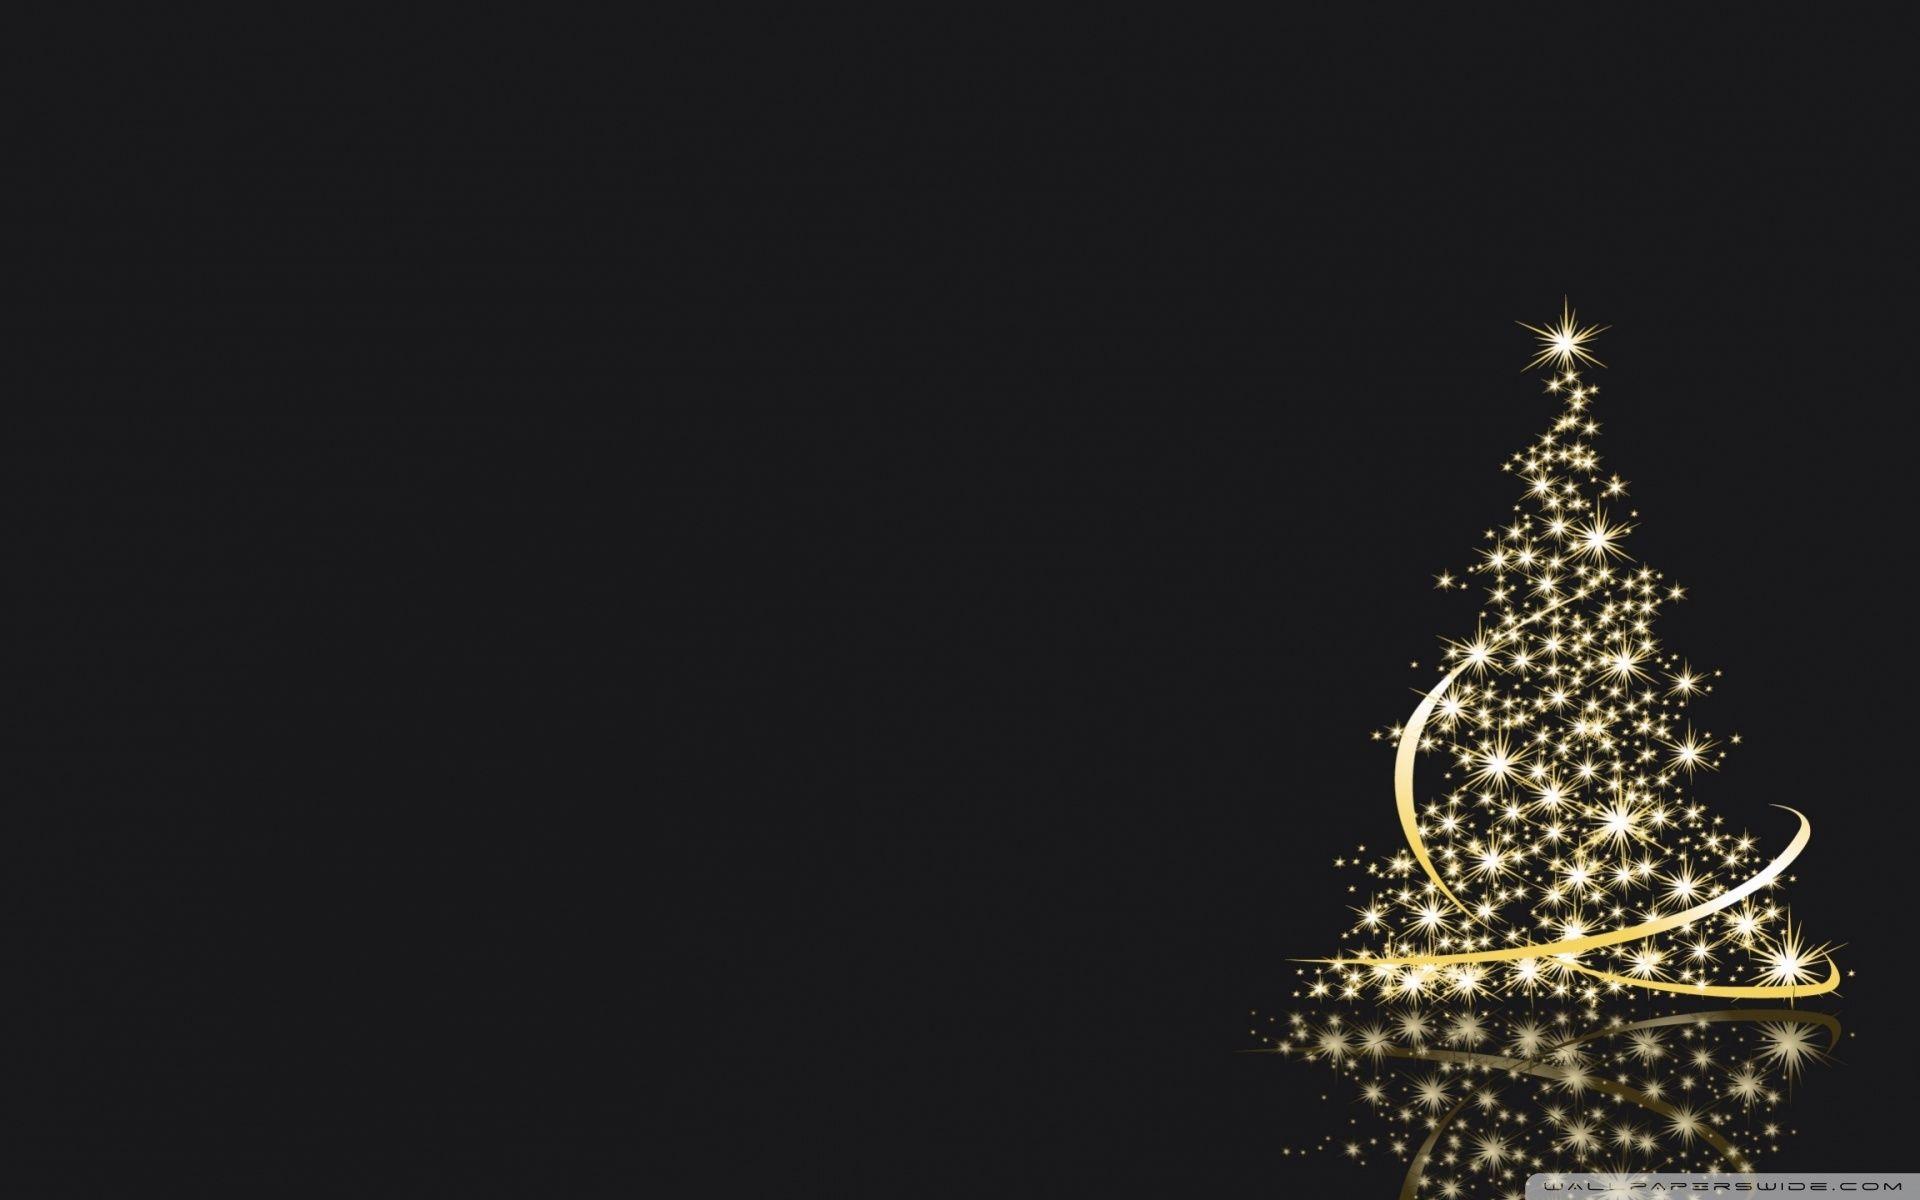 Pin on Christmas Images 1920x1200